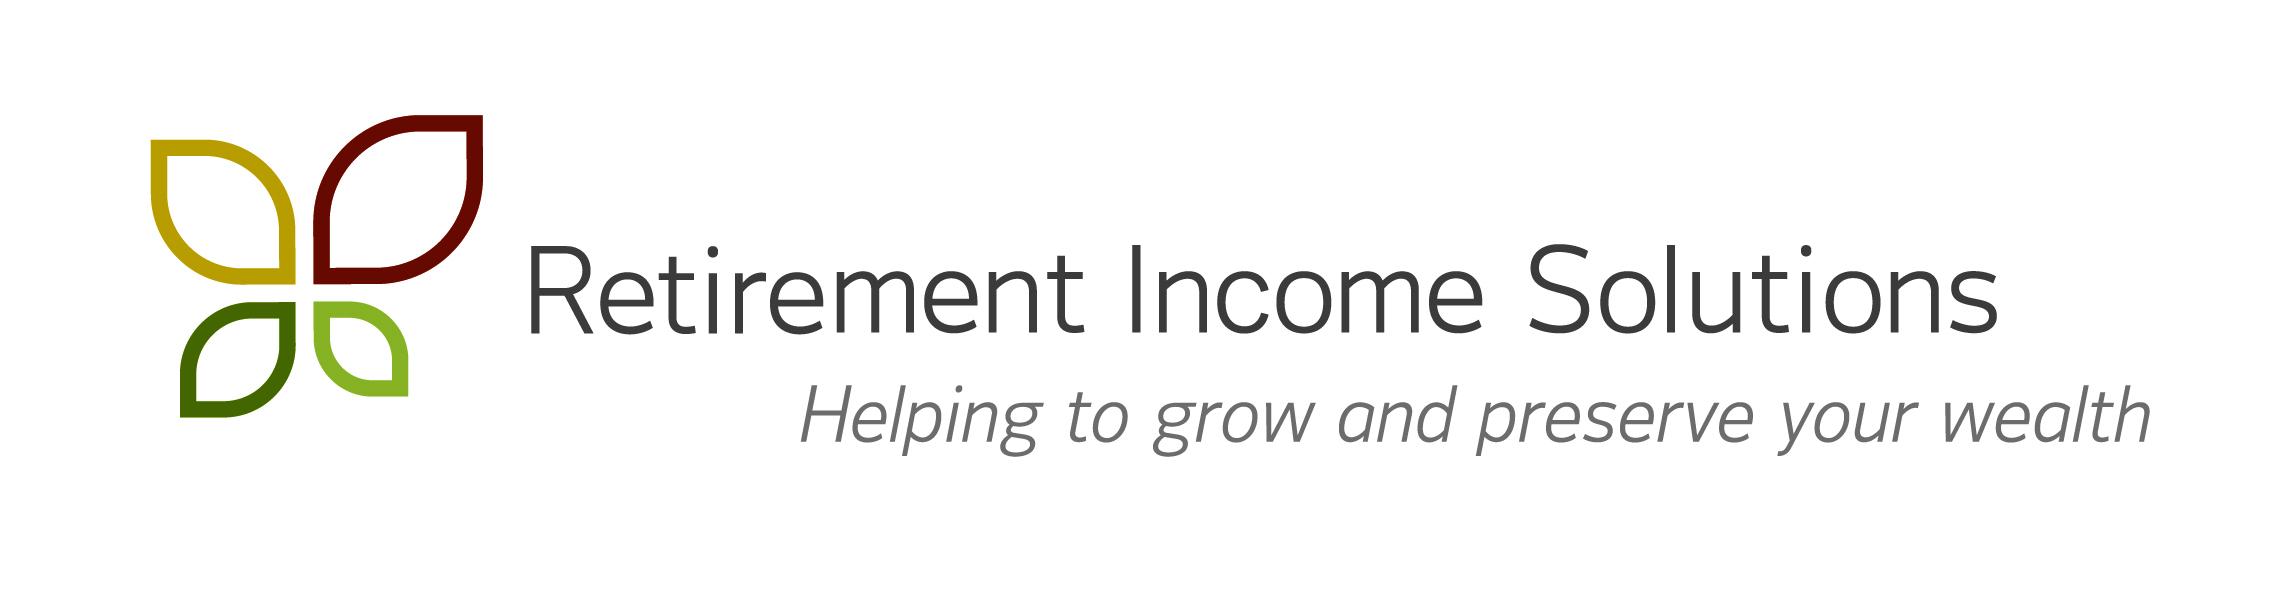 Retirement Income Solutions Logo.jpg